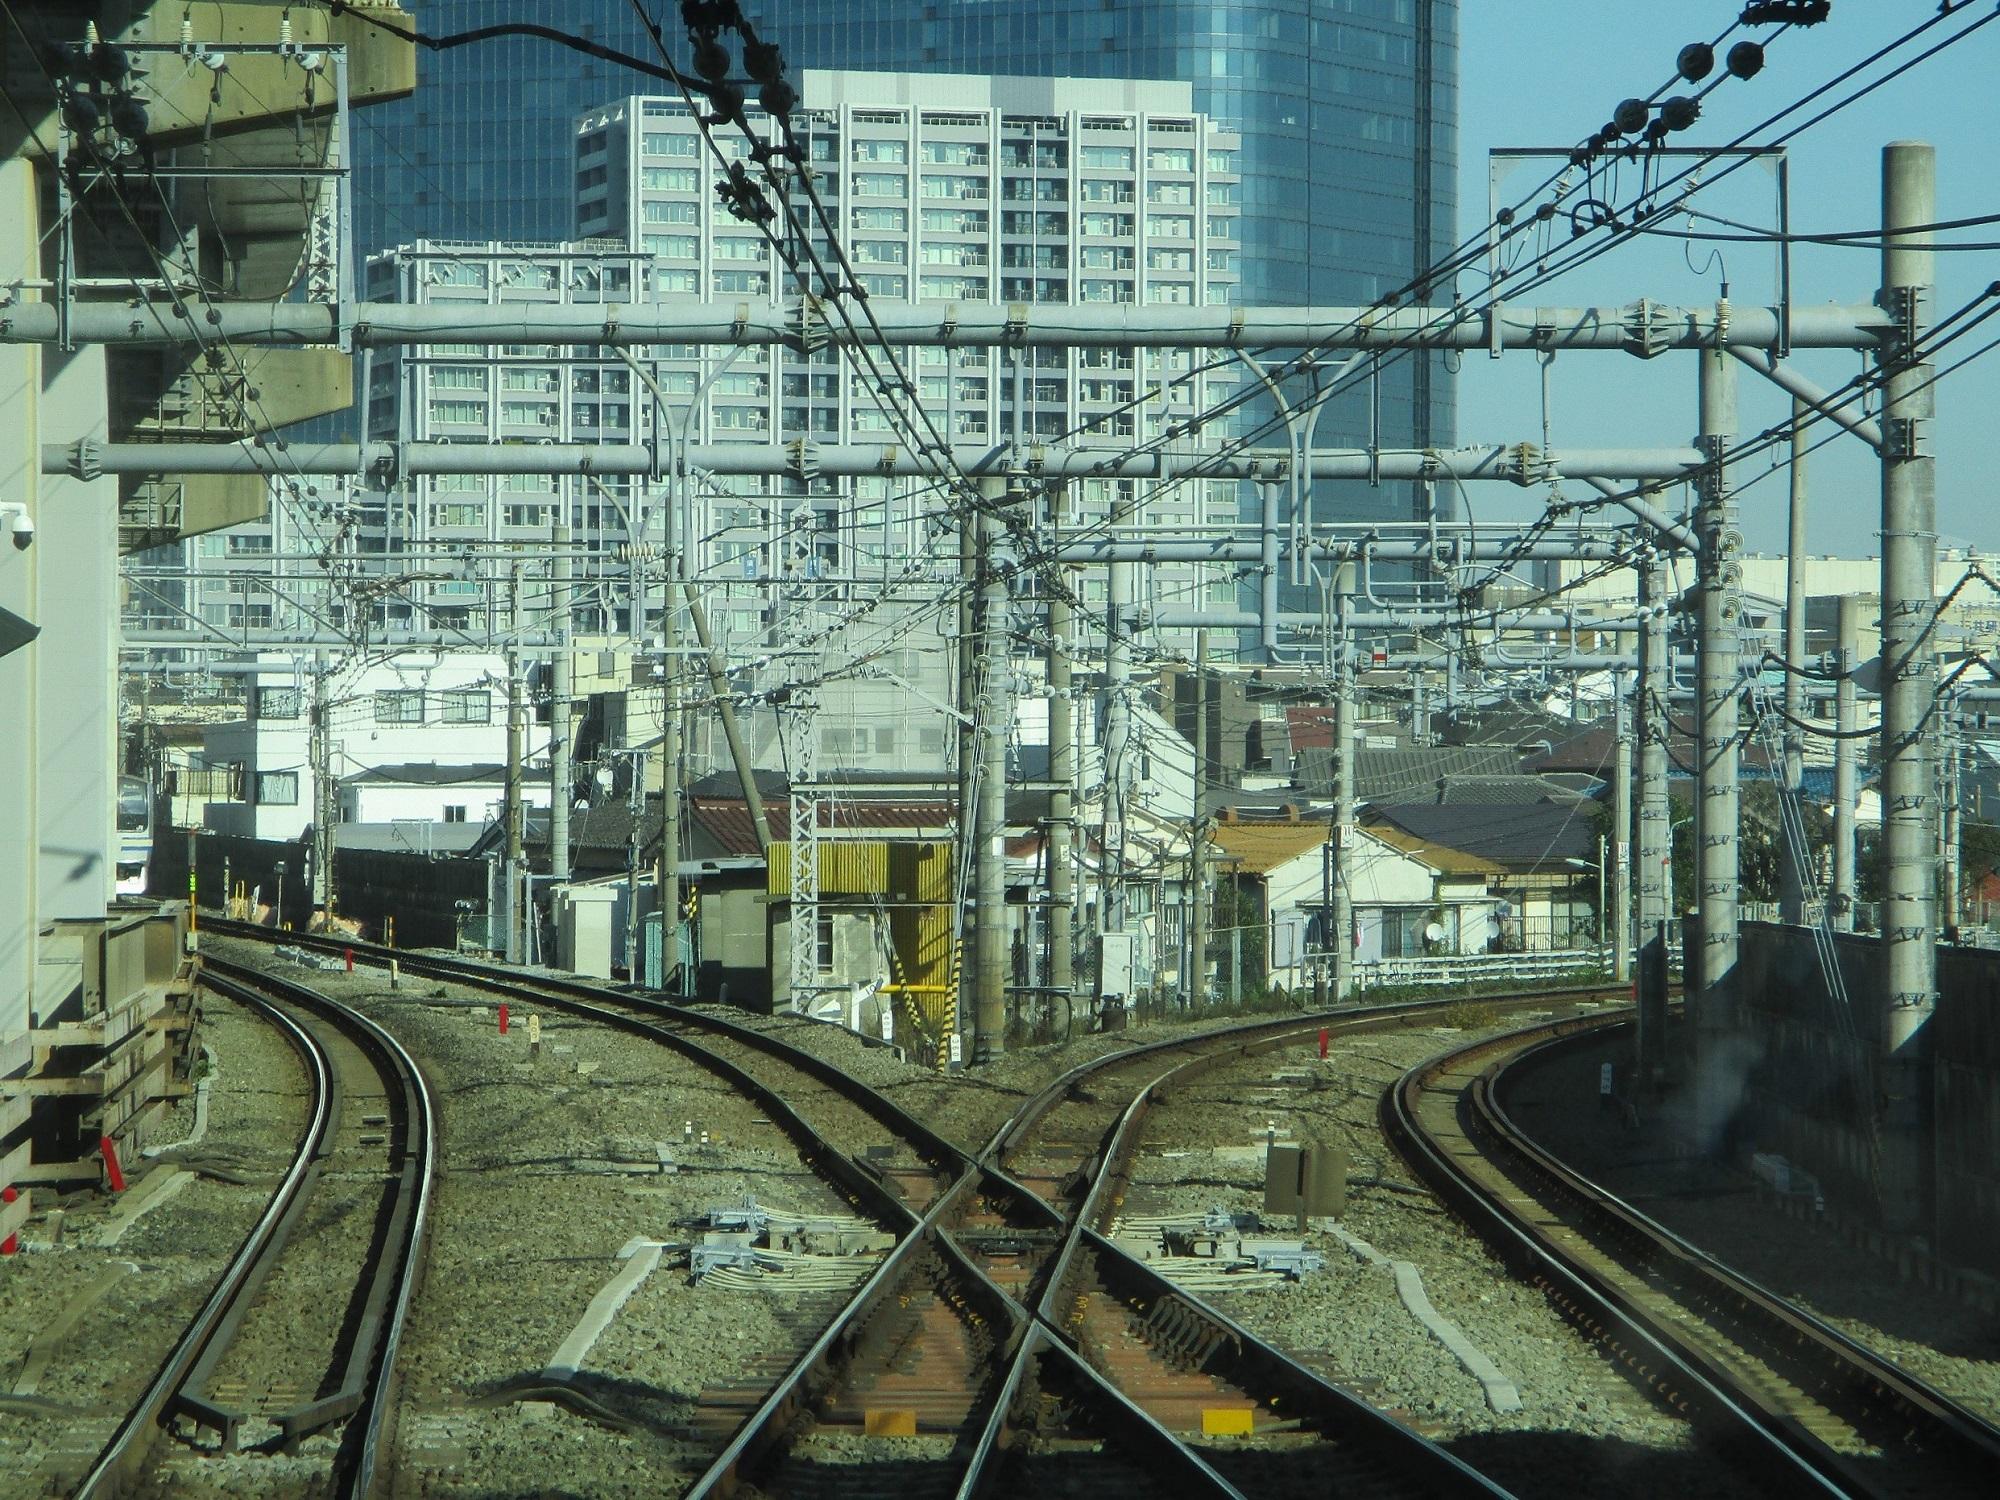 2019.12.16 (133) 新宿いき各停 - 西大井大崎間(分岐) 2000-1500